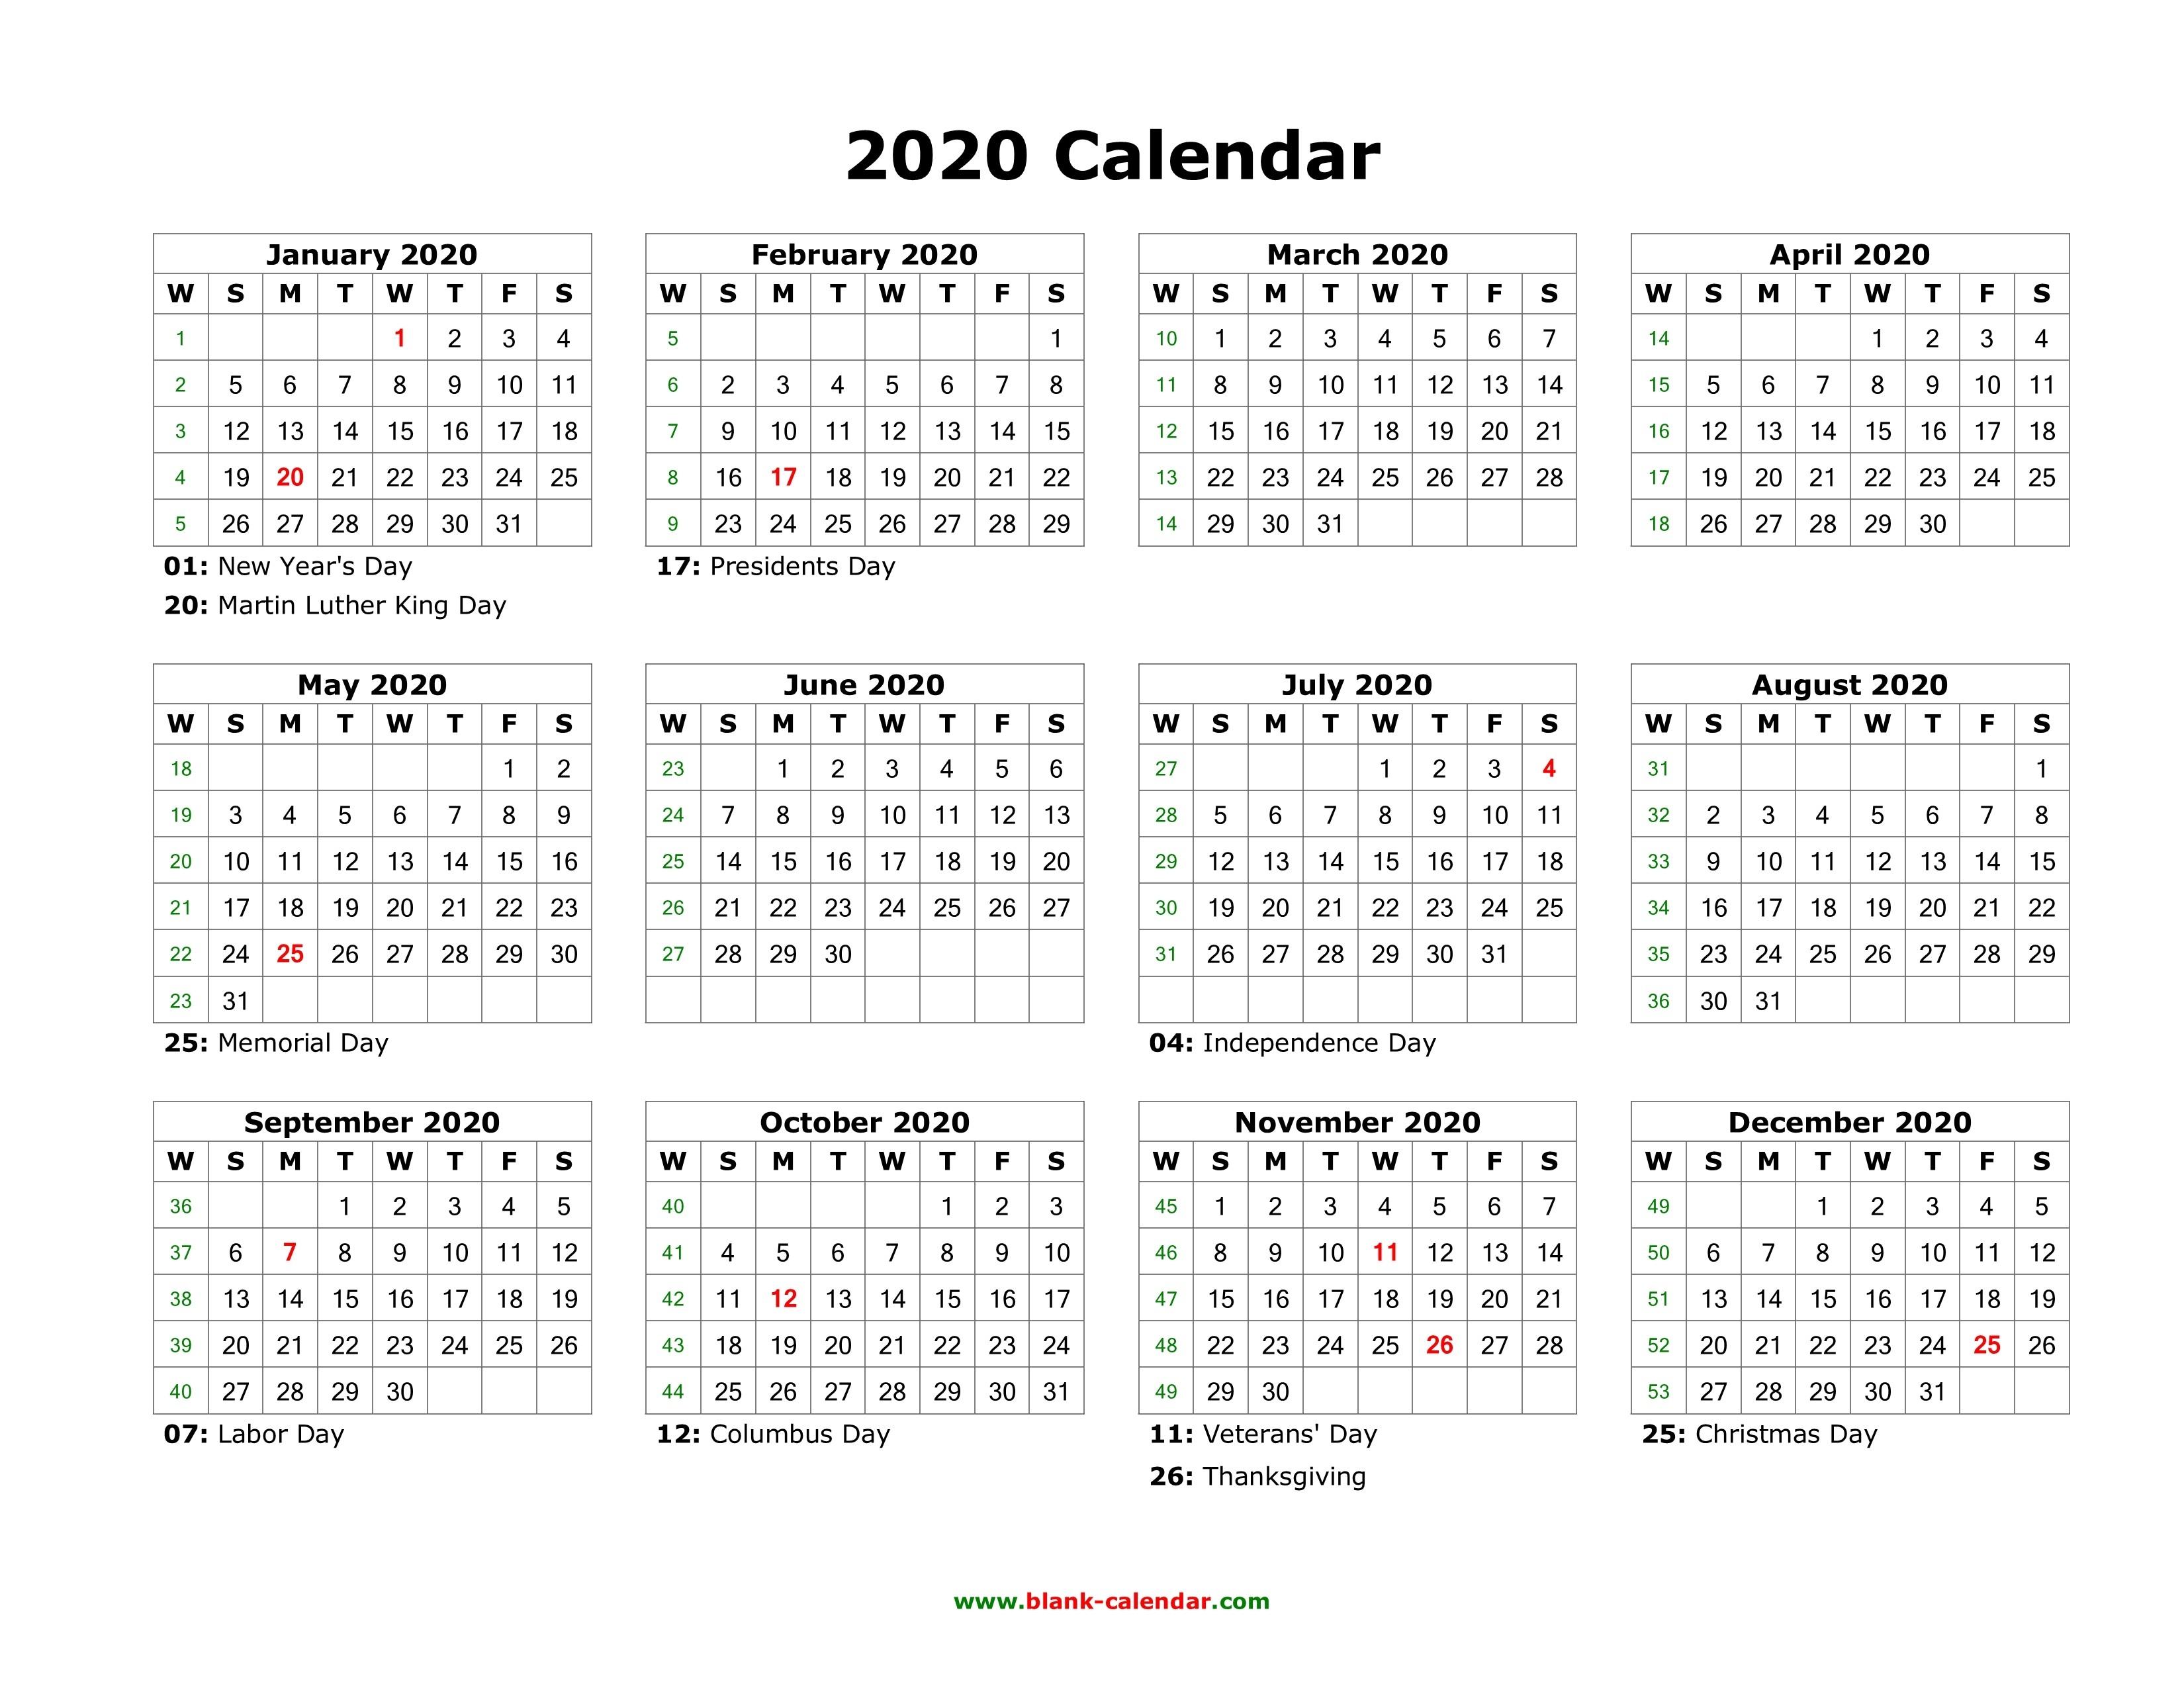 2020 Calendar - Parfu.kaptanband.co-2020 Calendar South Africa With Public Holidays And School Terms